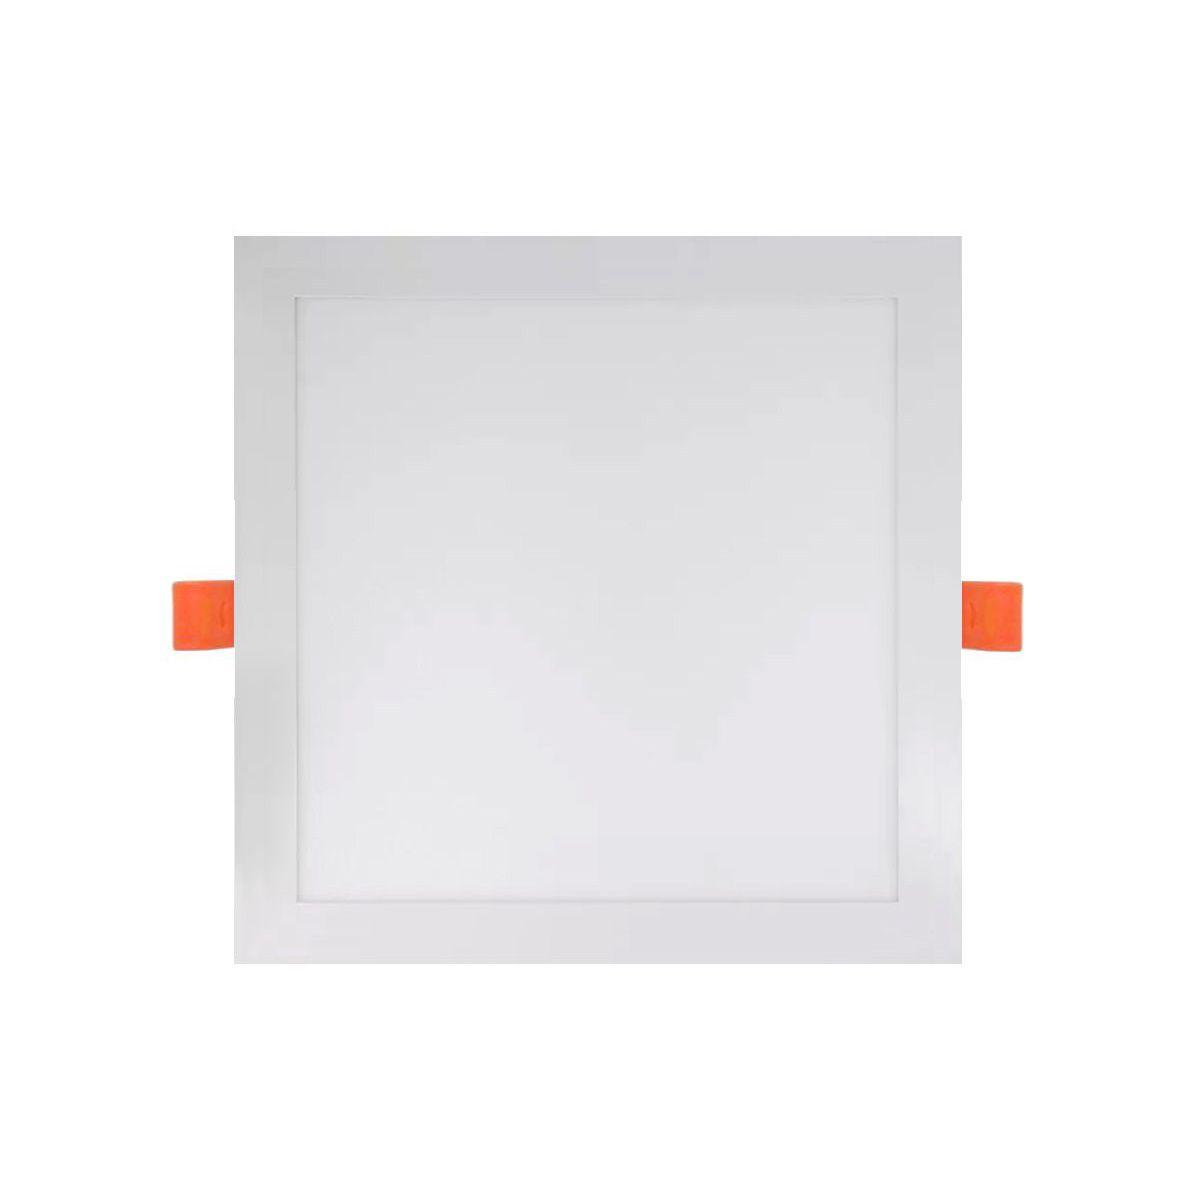 Painel LED Downlights de embutir Quadrado 18W 4000K Bivolt 22X22cm - Initial